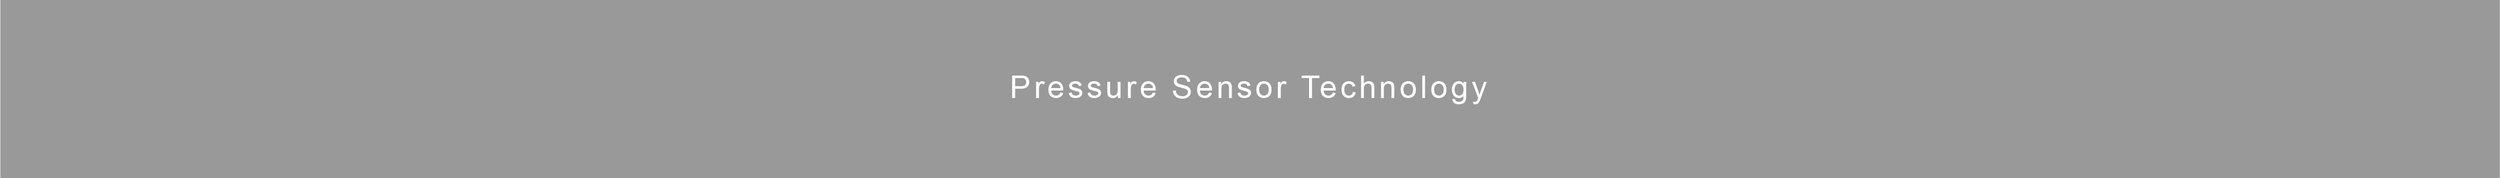 Pressure Sensor Development-02.jpg